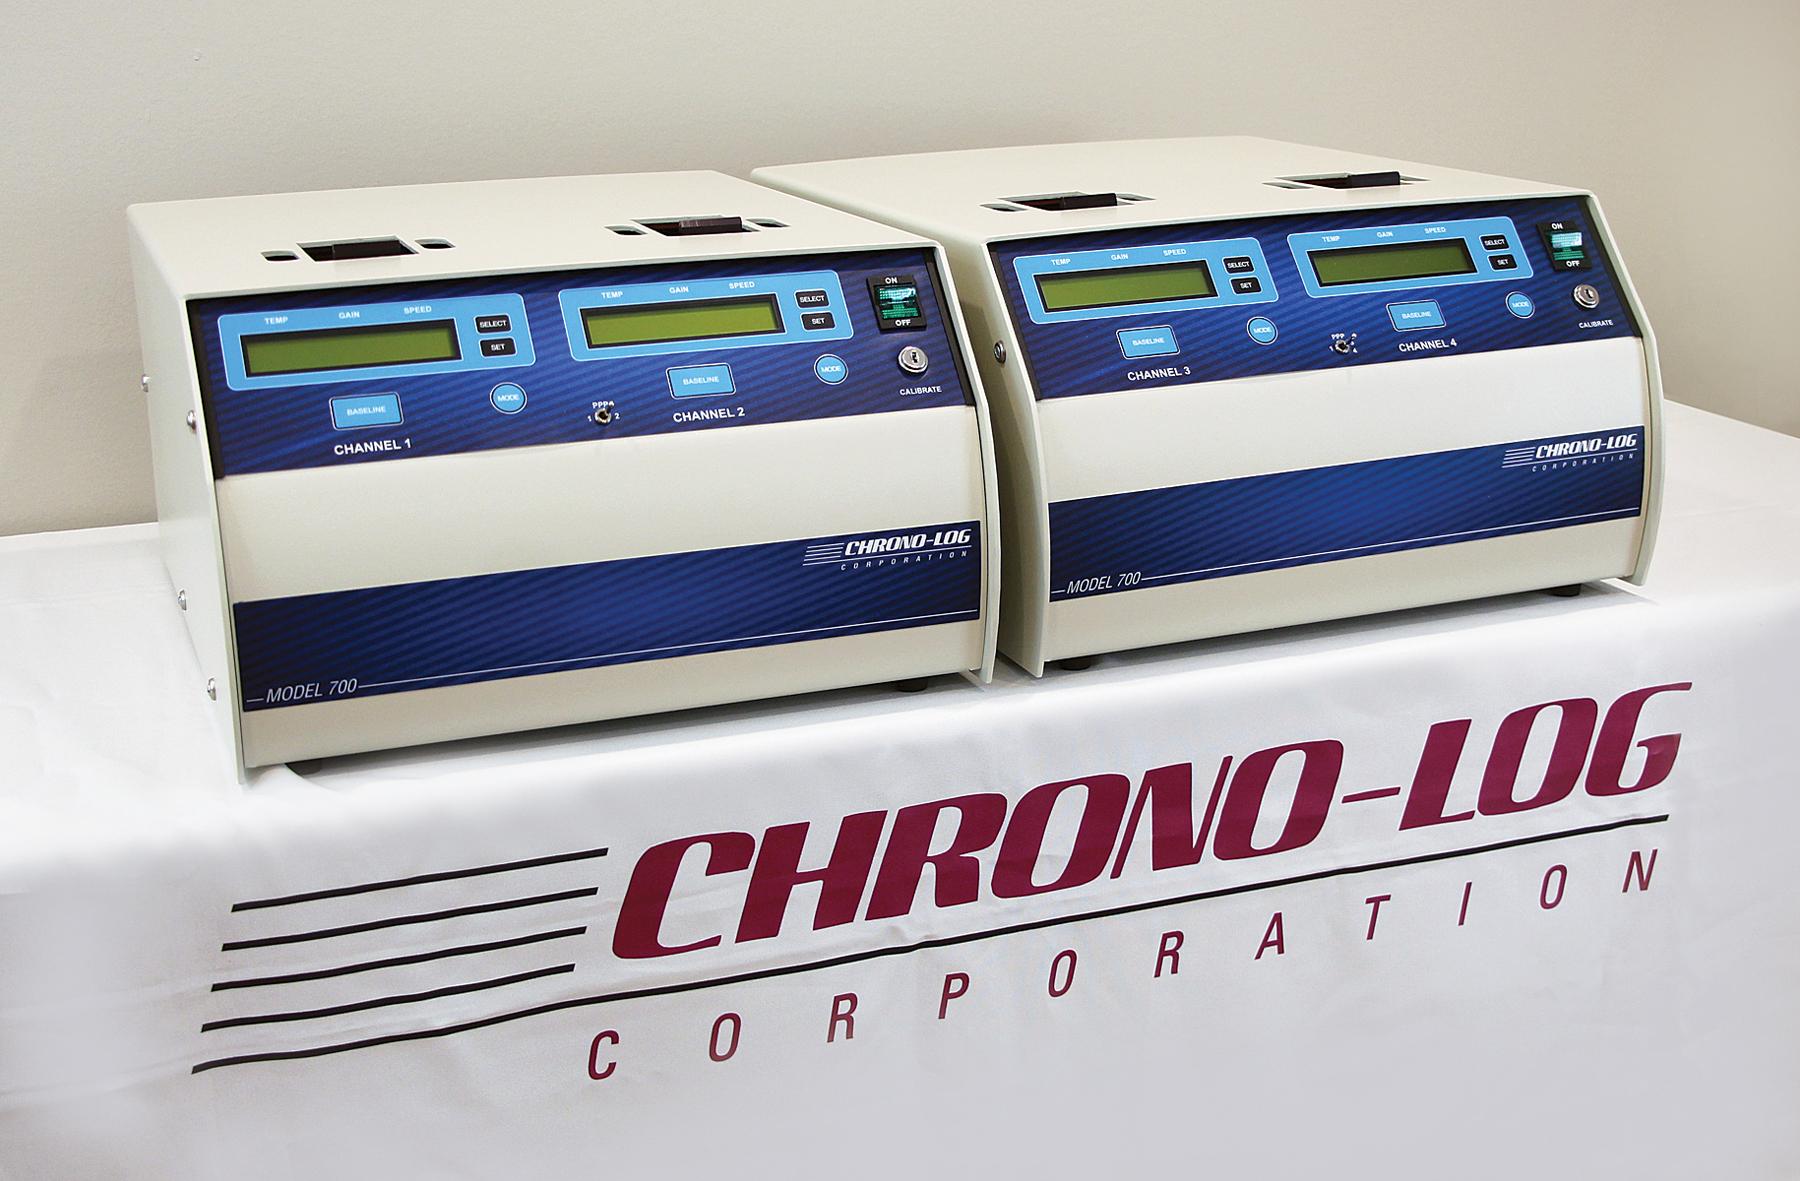 Two CHRONO-LOG Model 700 Whole Blood and Optical Lumi-Aggregometers on display